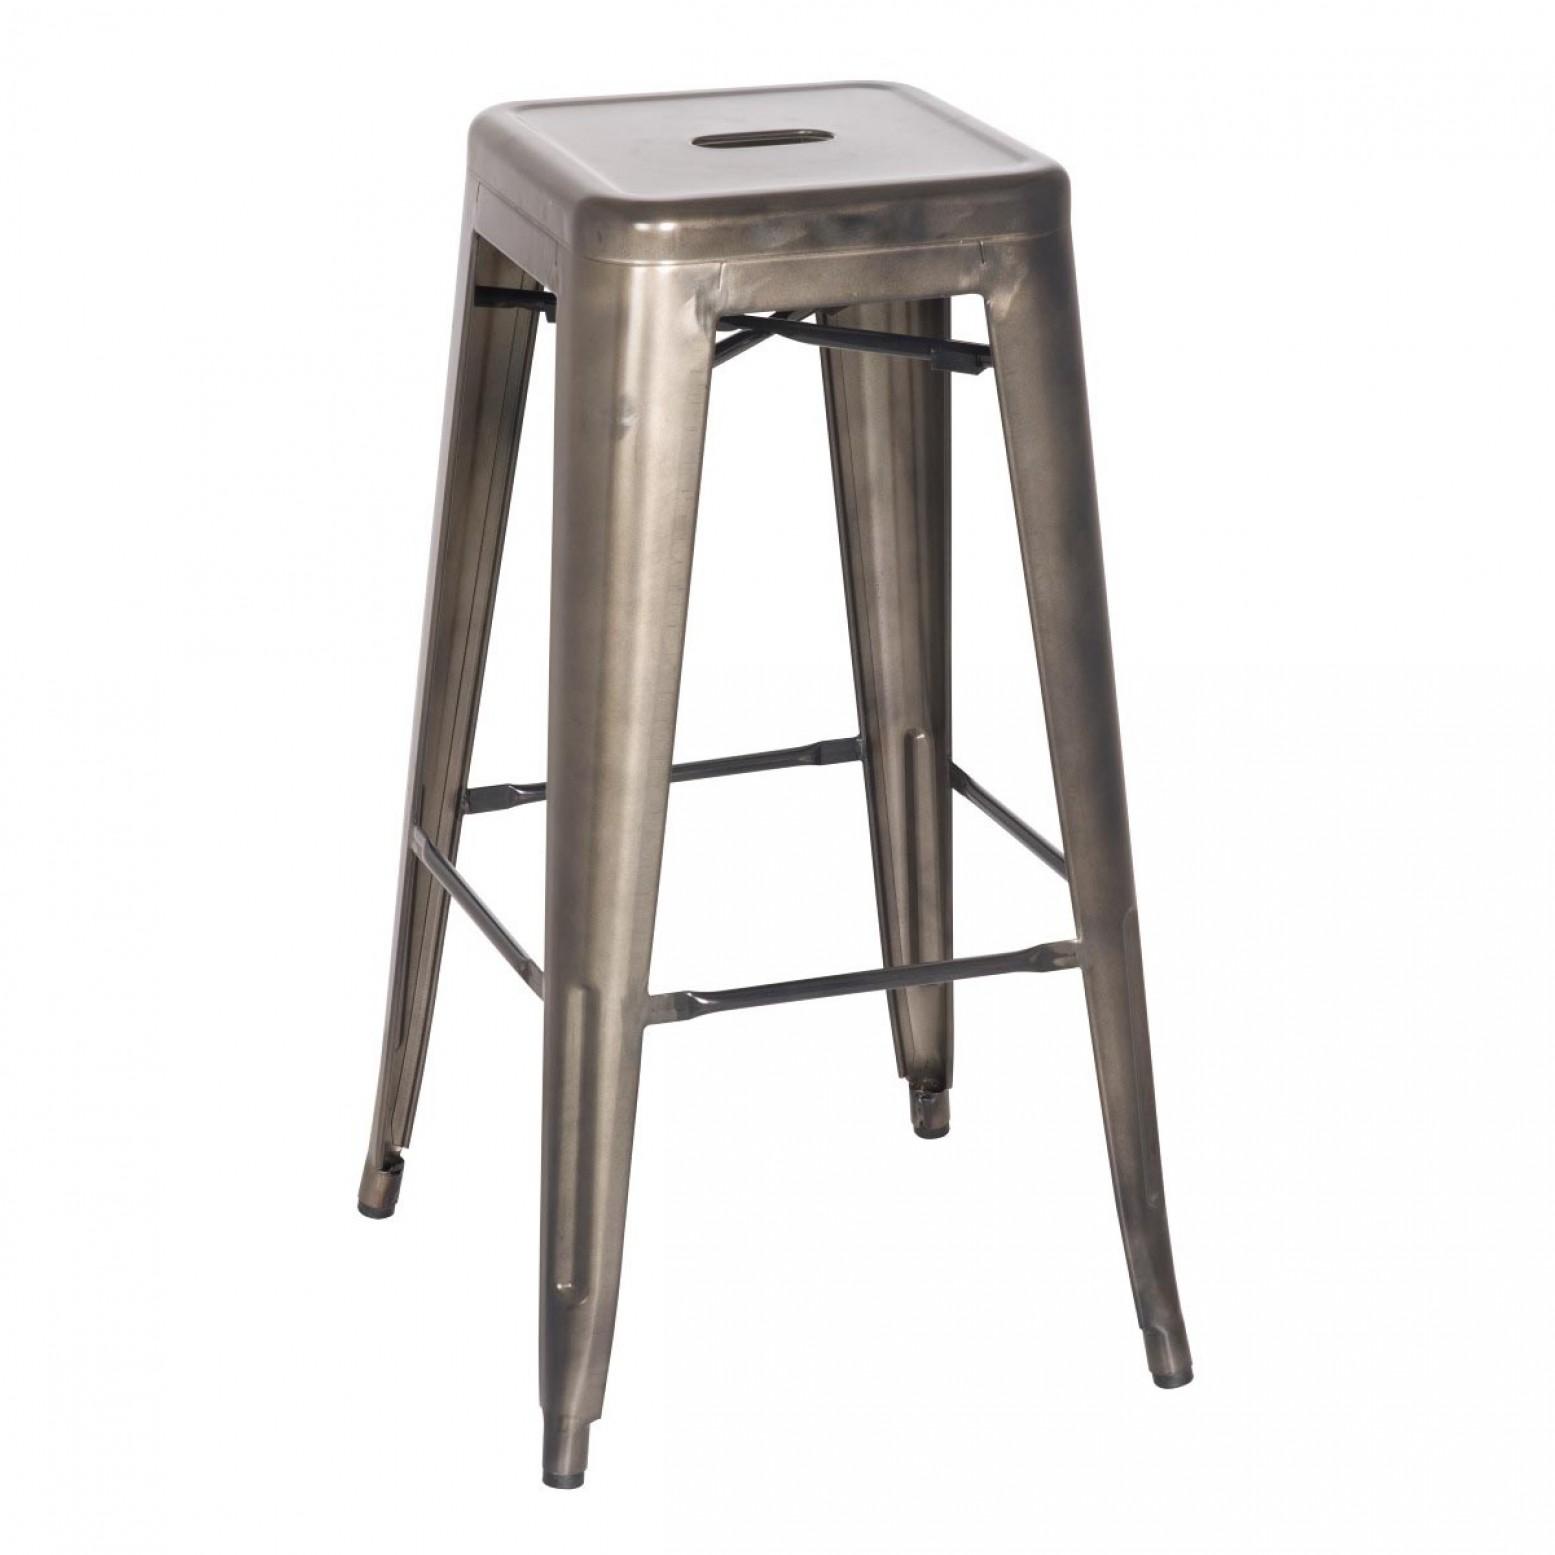 Excellent Metropolis Metal Backless Bar Stool Gunmetal Creativecarmelina Interior Chair Design Creativecarmelinacom